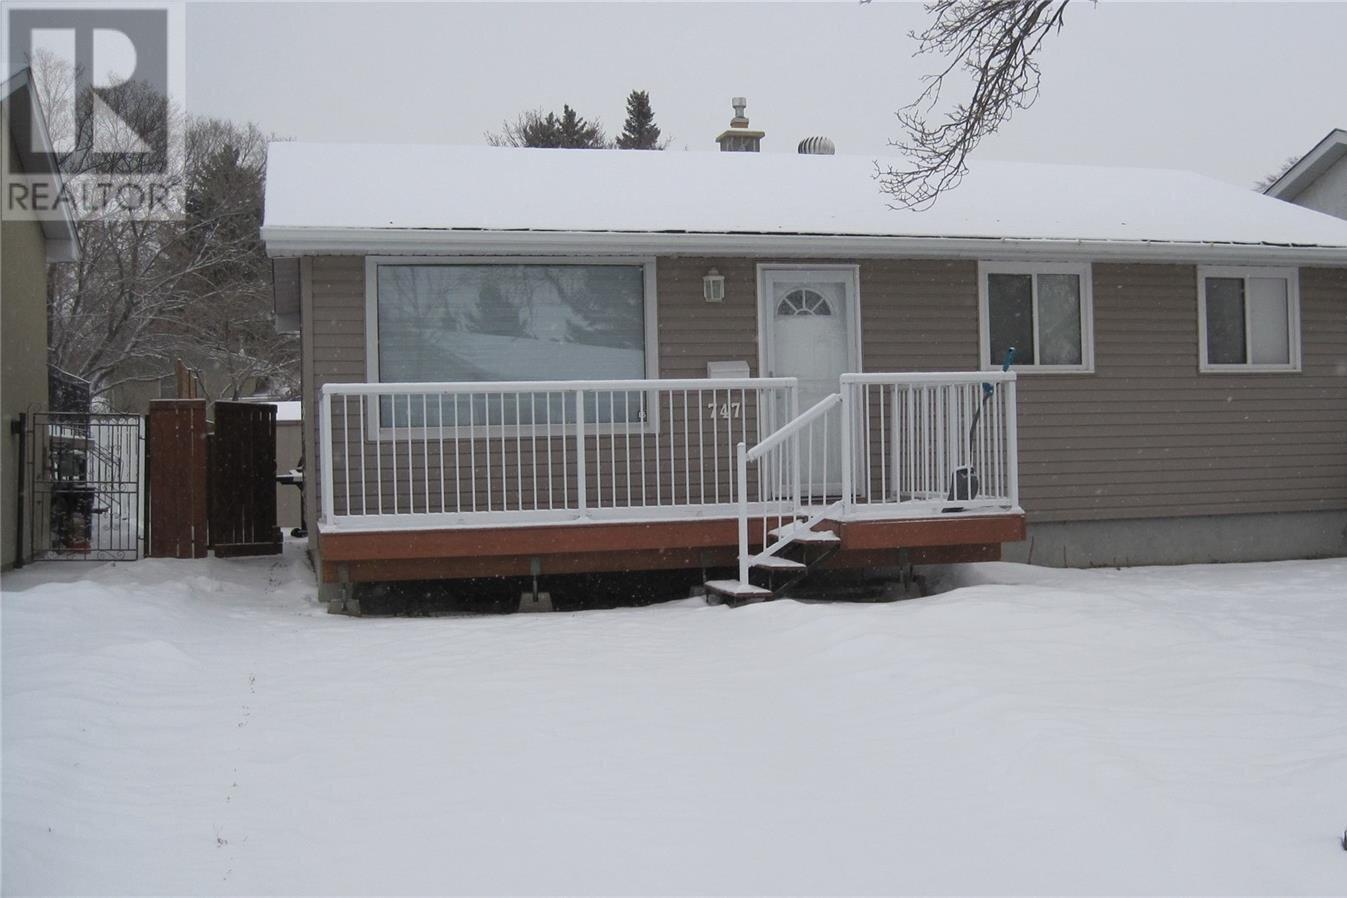 House for sale at 747 Sneddon St Regina Saskatchewan - MLS: SK834088